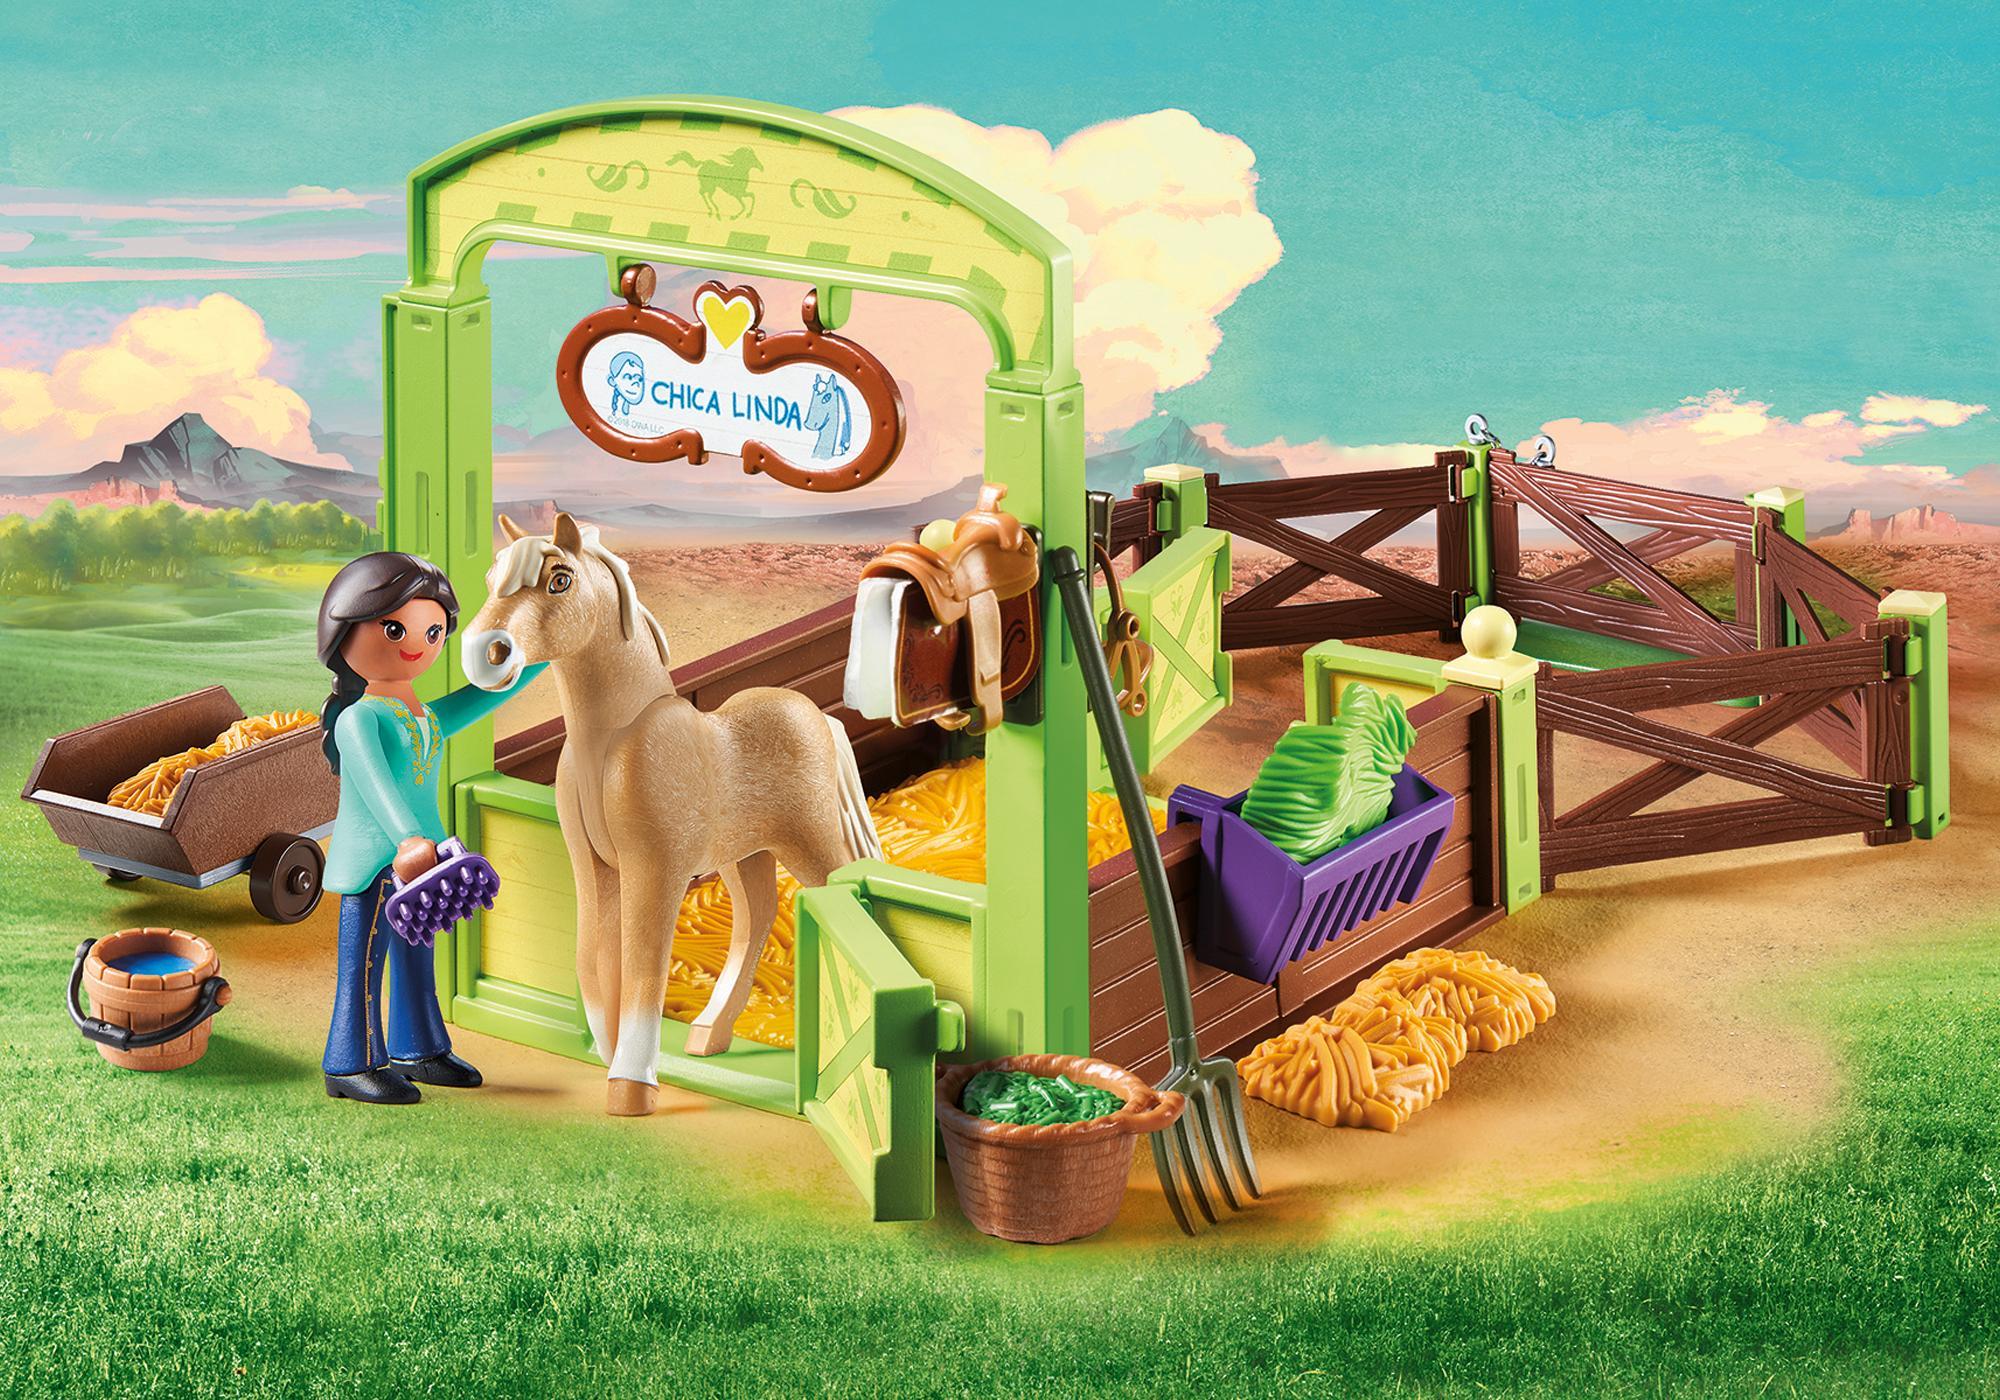 http://media.playmobil.com/i/playmobil/9479_product_detail/Establo Pru y Chica Linda